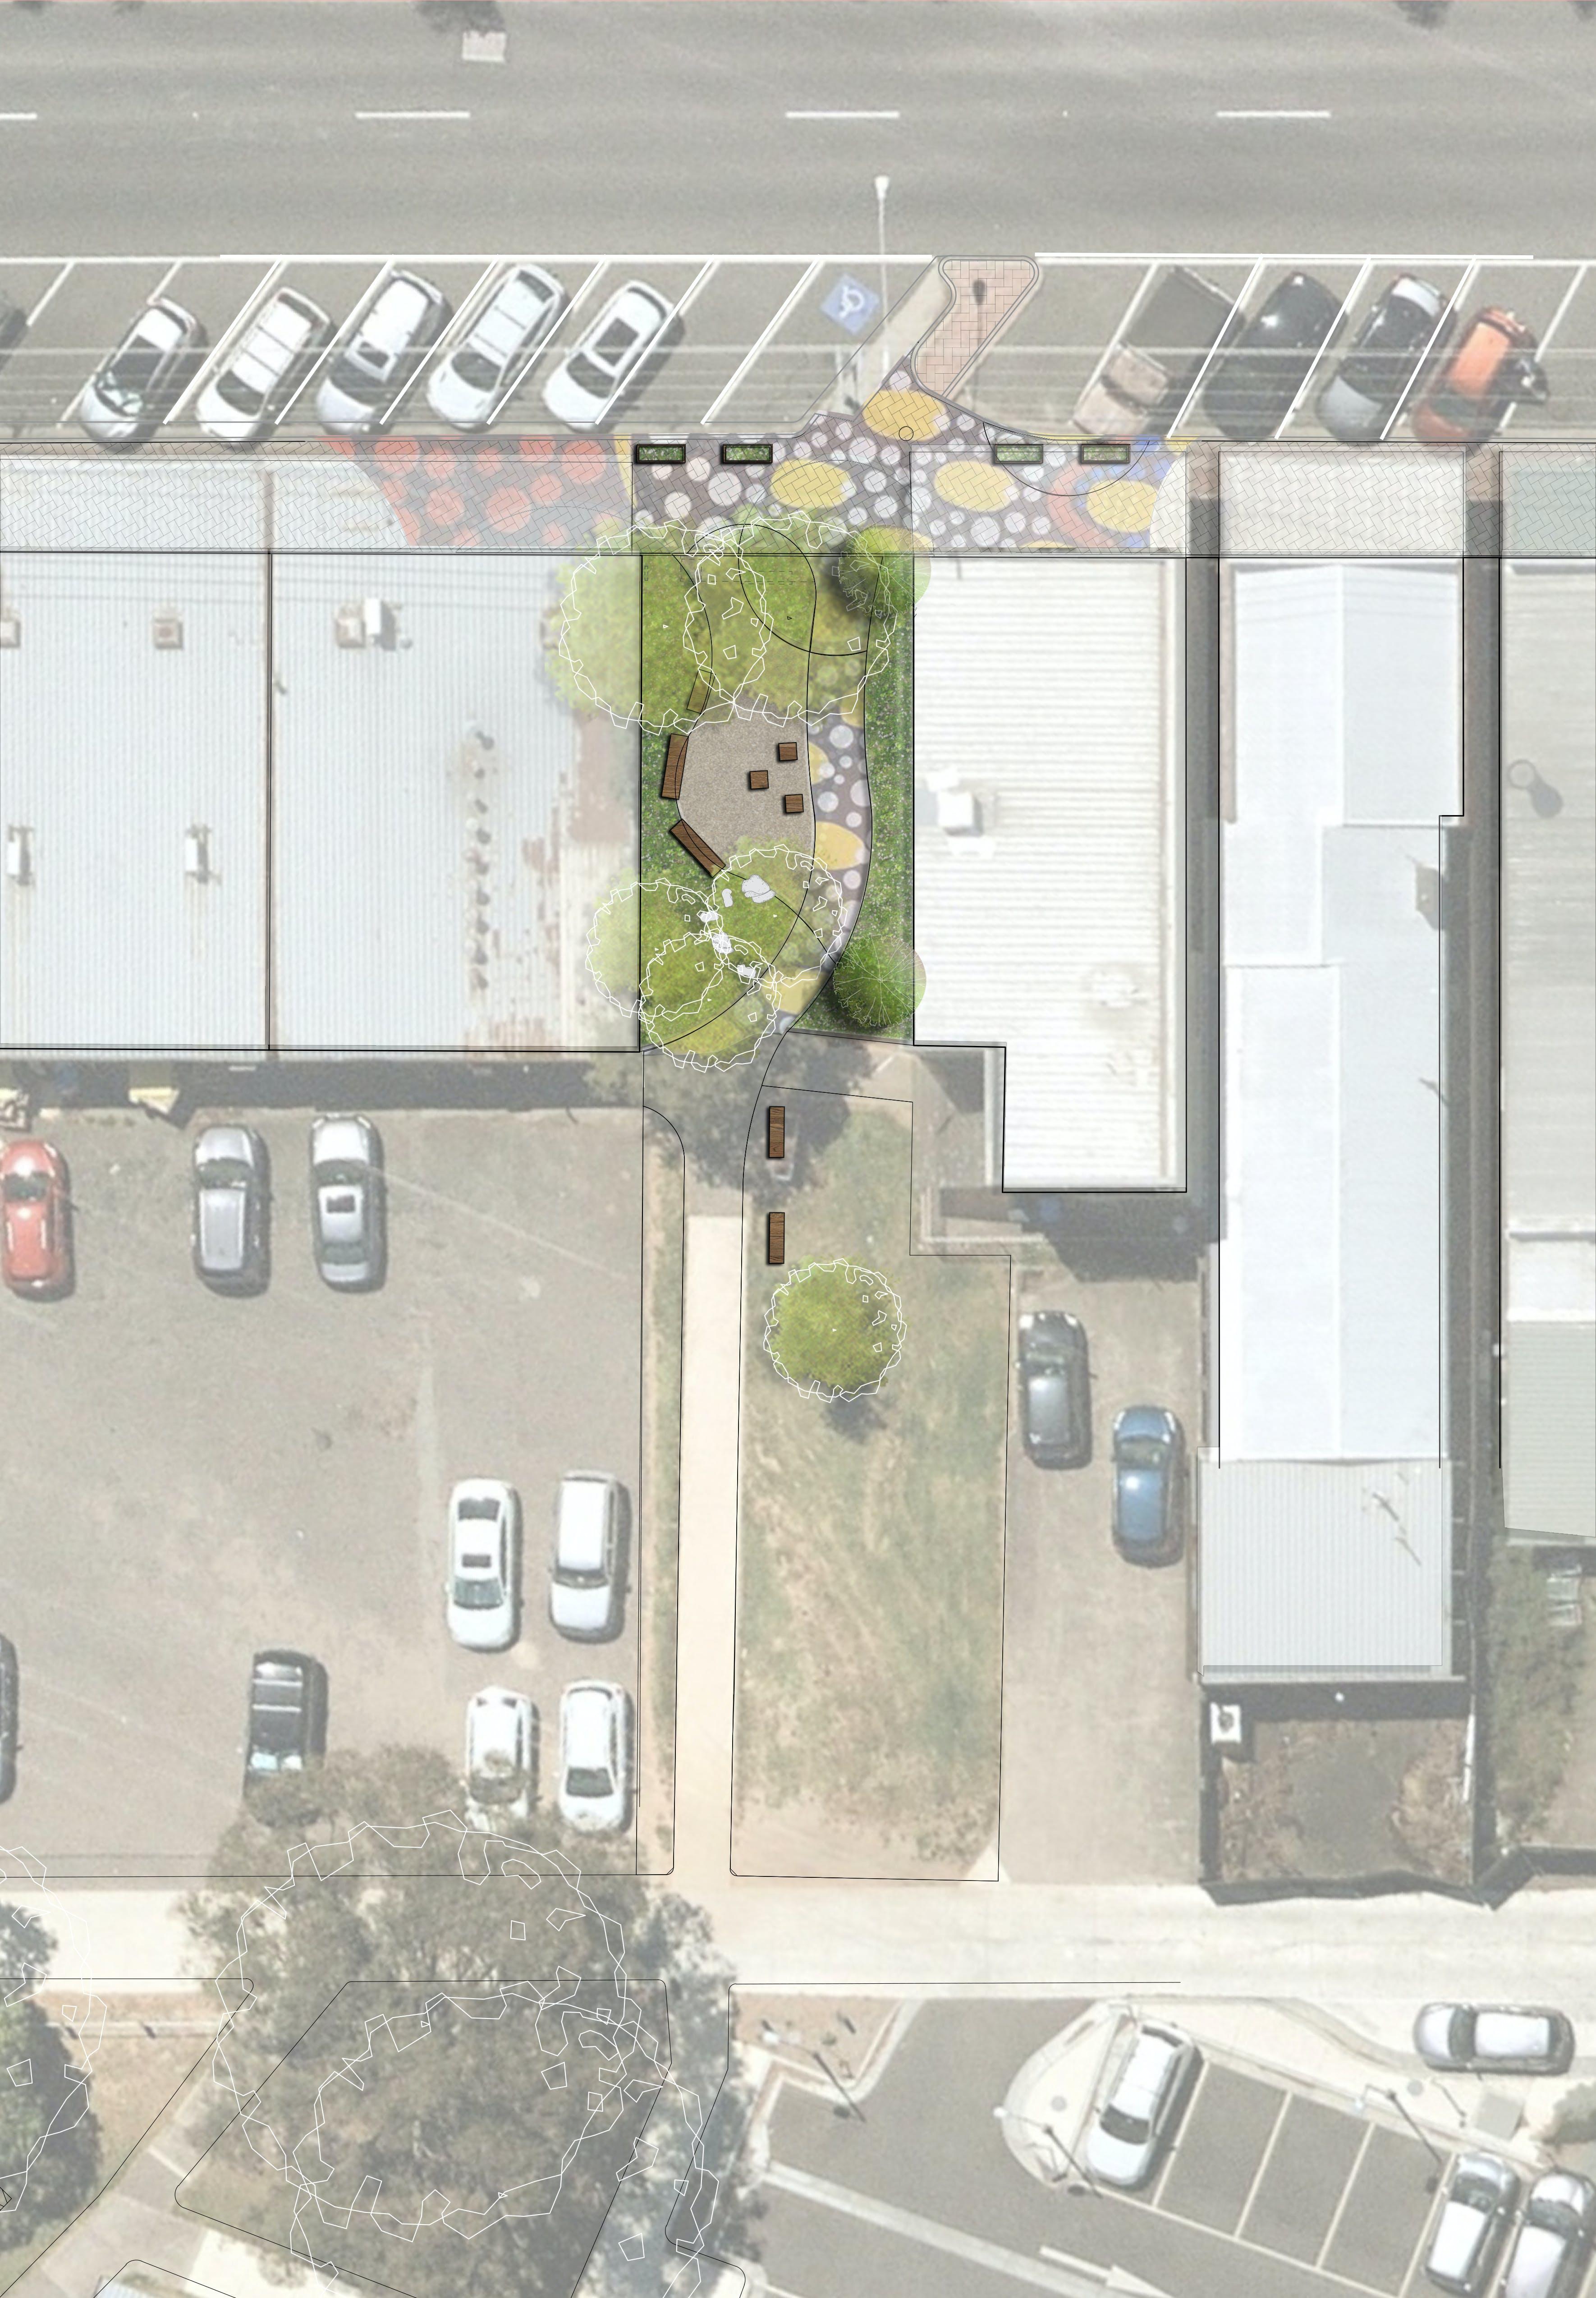 Laneway Park - Concept Plan - Ringwood East (002).jpg